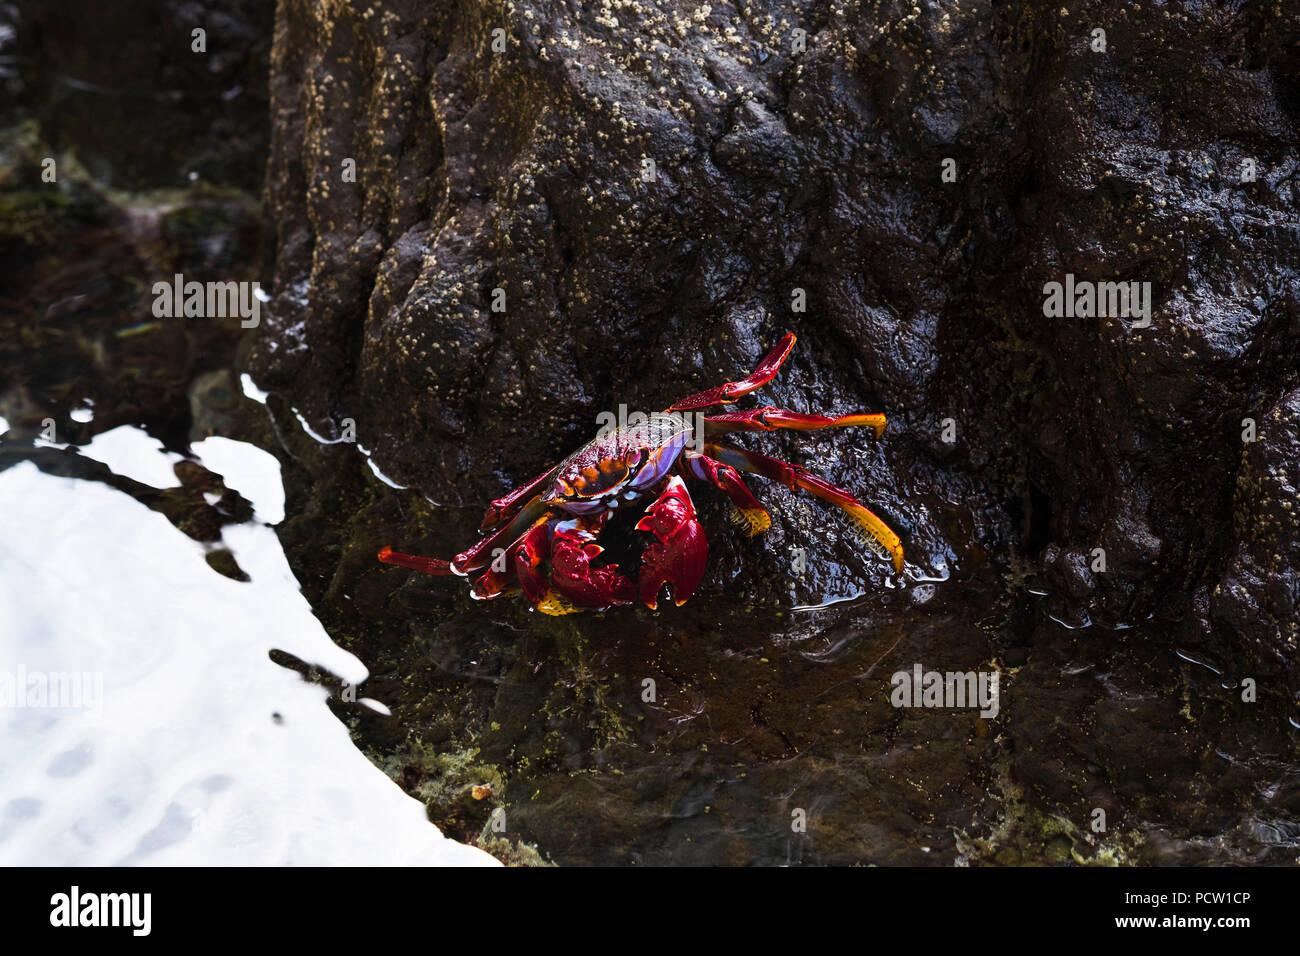 Ostatlantik Red Rock Crab (Grapsus adscensionis), La Gomera, Kanarische Inseln, Kanaren, Spanien Stockfoto